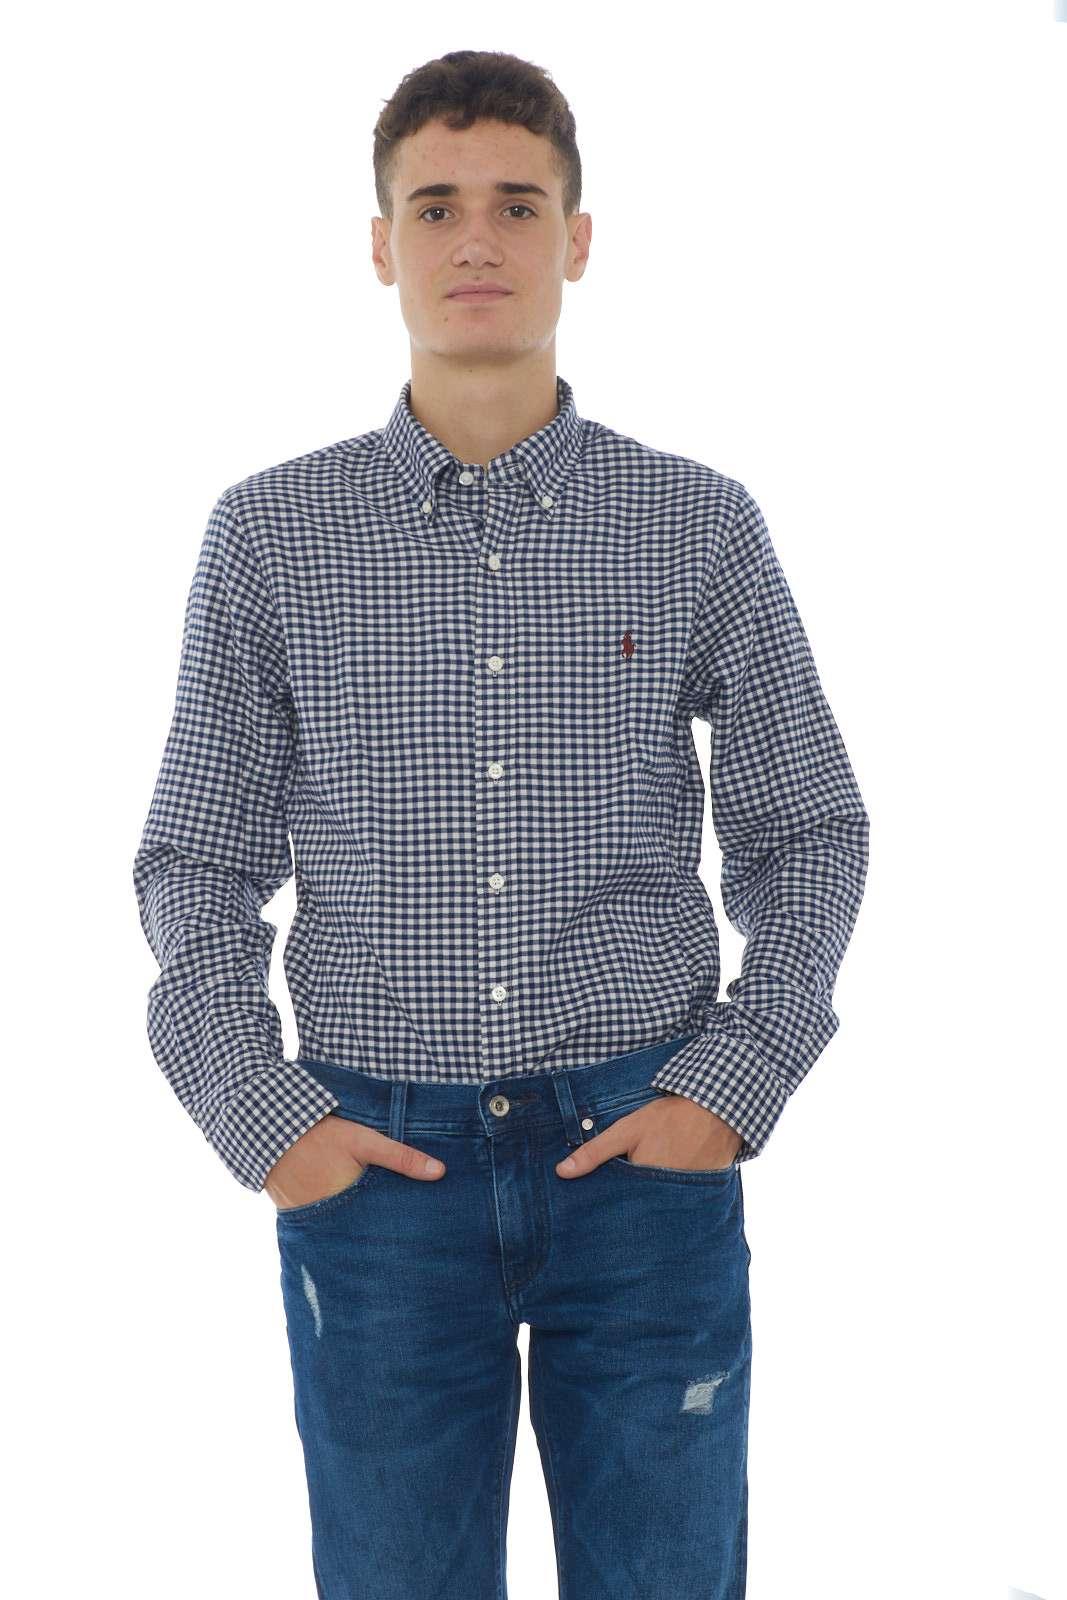 https://www.parmax.com/media/catalog/product/a/i/AI-outlet_parmax-camicia-uomo-Ralph-Lauren-710767420001-A.jpg